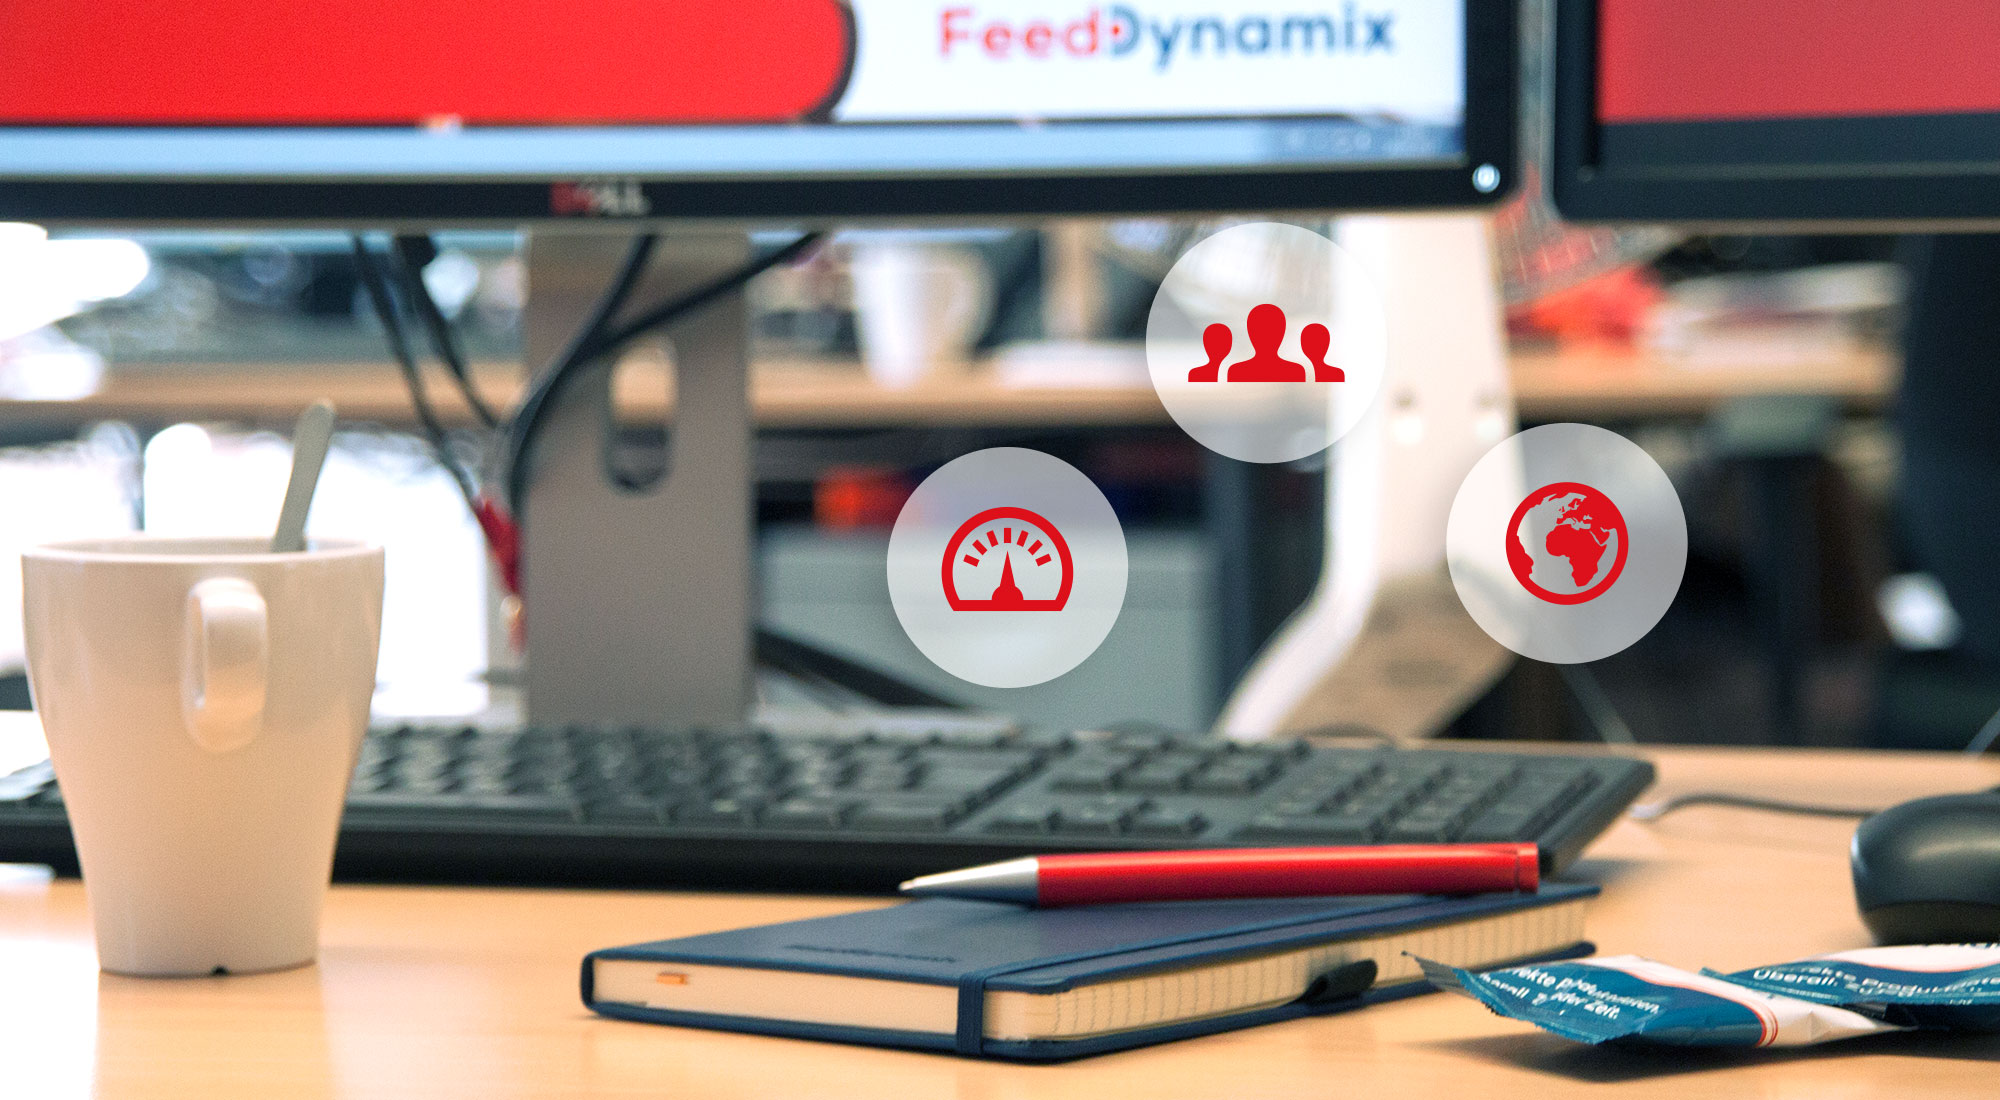 Karriere offene stellenangebote in frankfurt feed dynamix for Stellenangebote grafikdesigner frankfurt